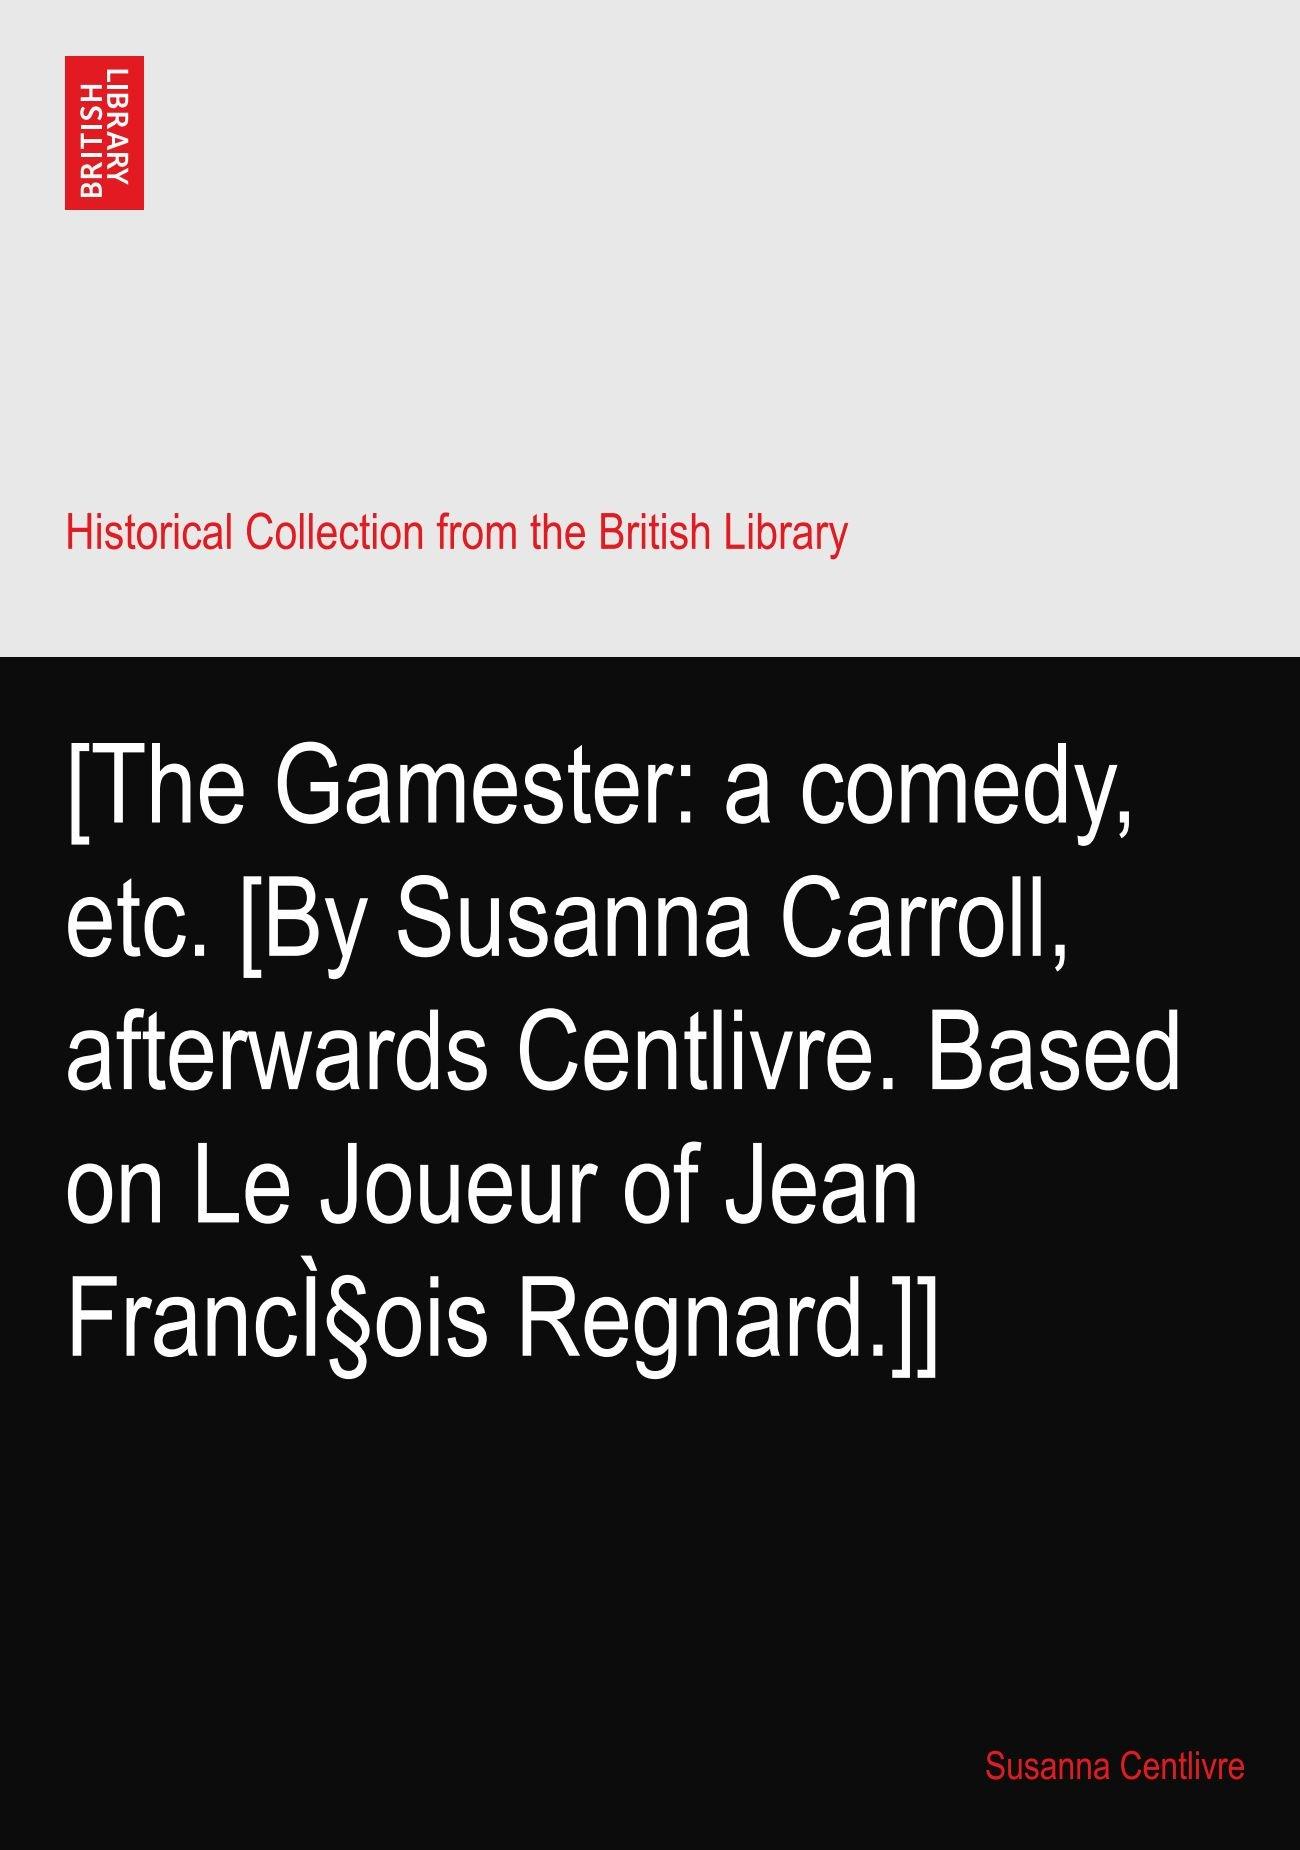 [The Gamester: a comedy, etc. [By Susanna Carroll, afterwards Centlivre.  Based on Le Joueur of Jean François Regnard.]]: Susanna Centlivre:  Amazon.com: ...